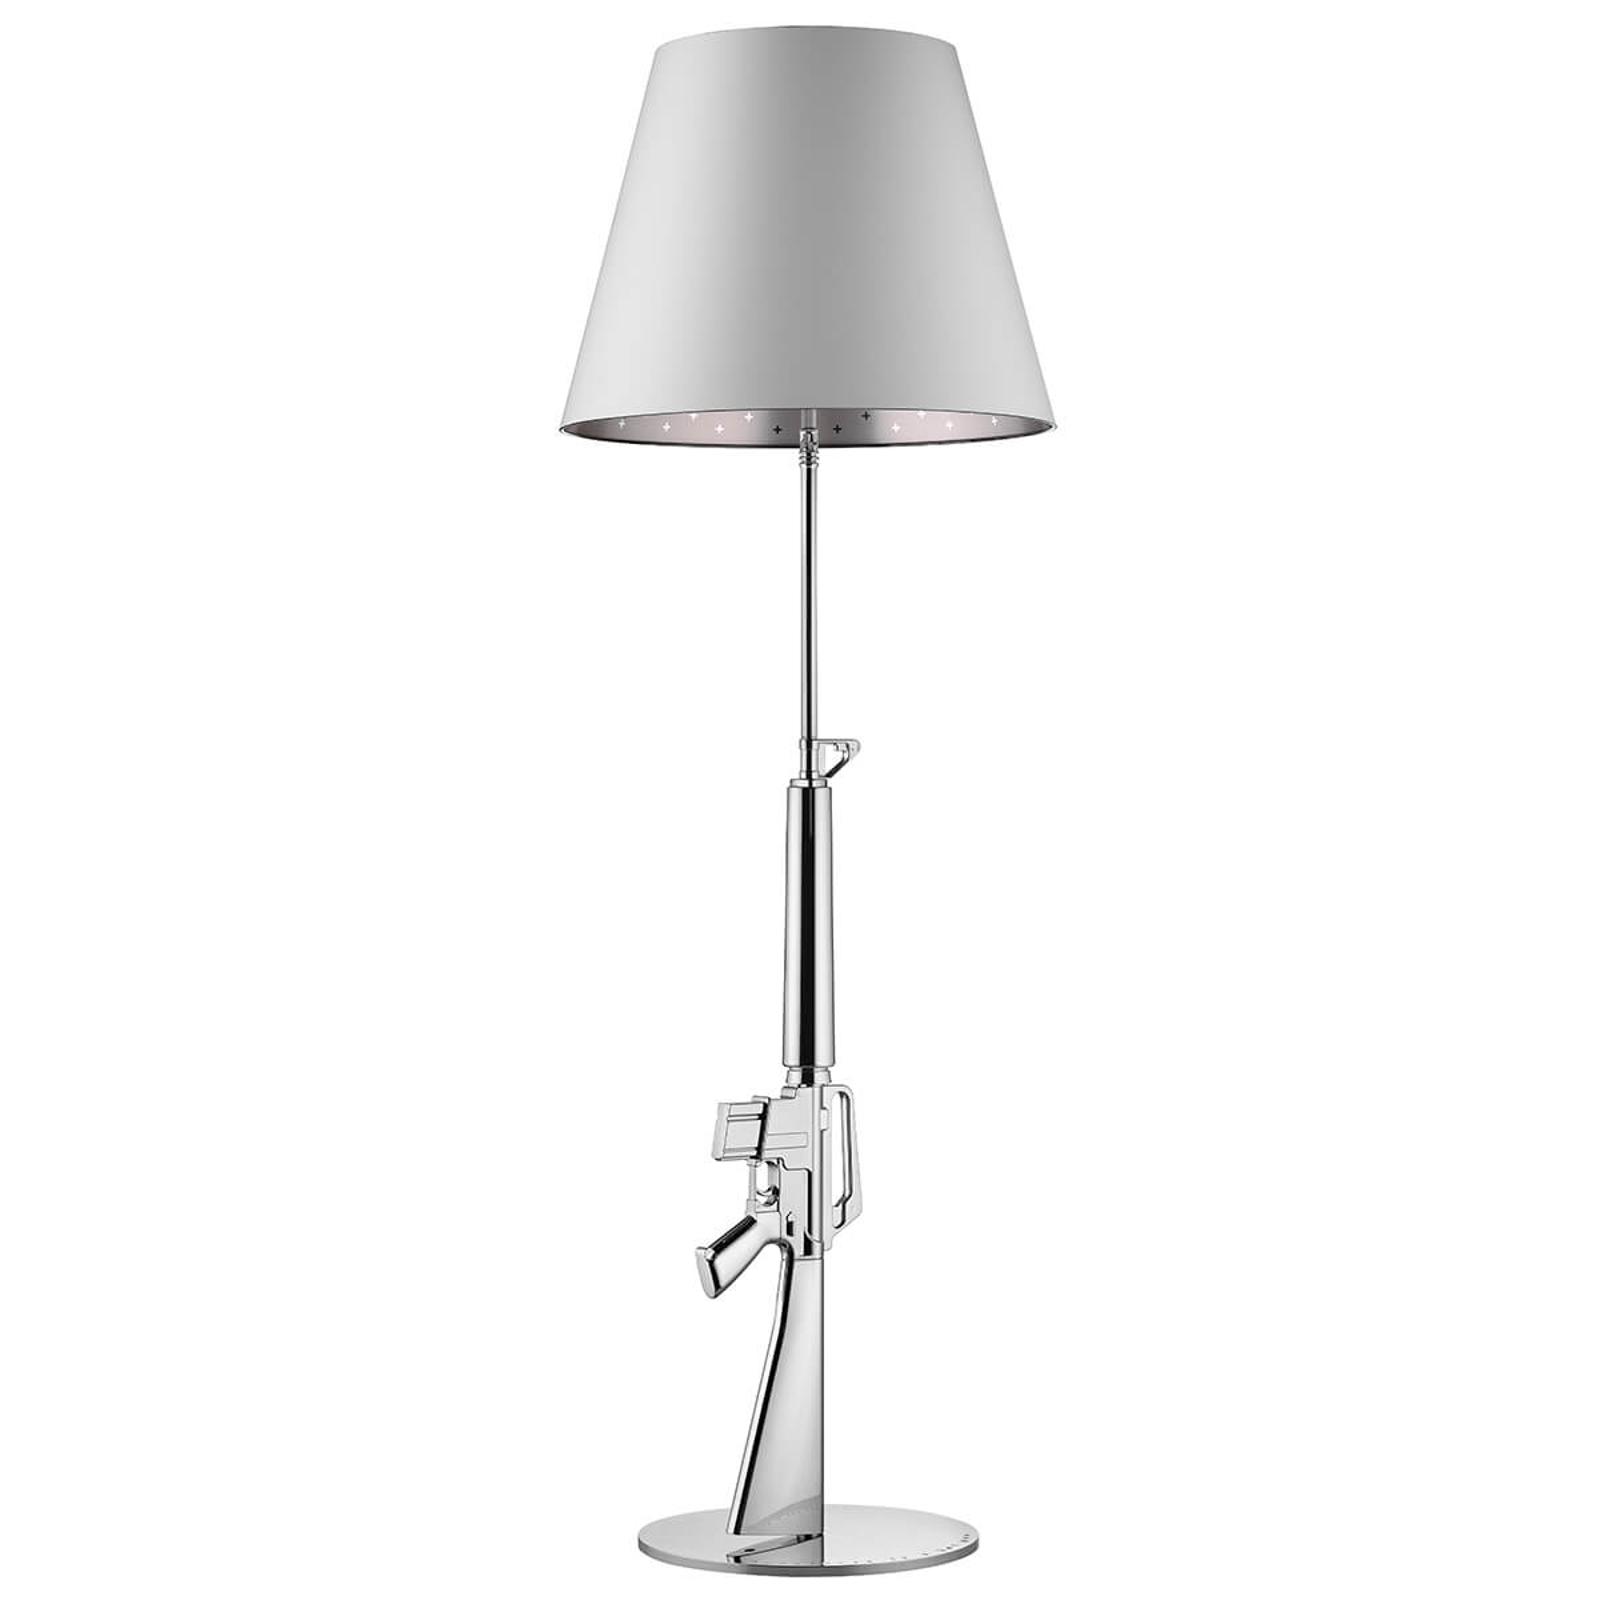 Garantert et blikkfang TABLE GUN bordlampe | Lampegiganten.no